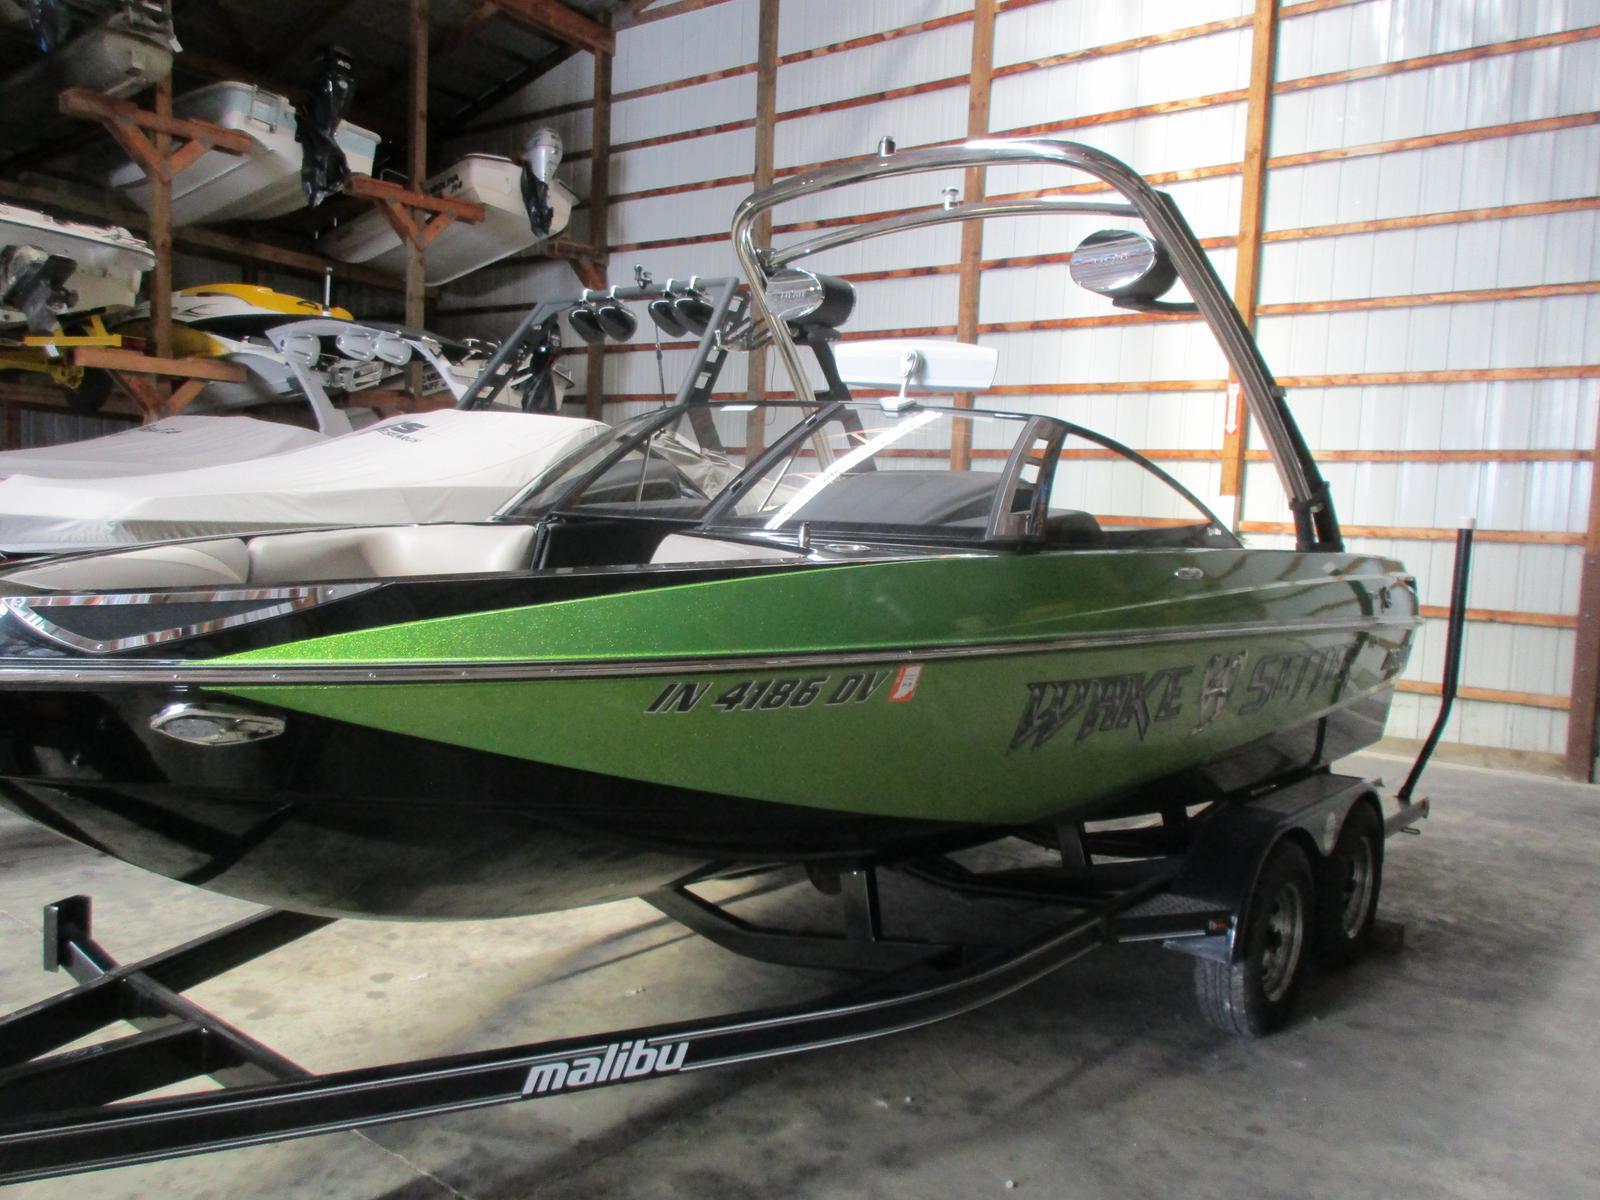 Malibu Boats LLC 20 VTX wakesetter